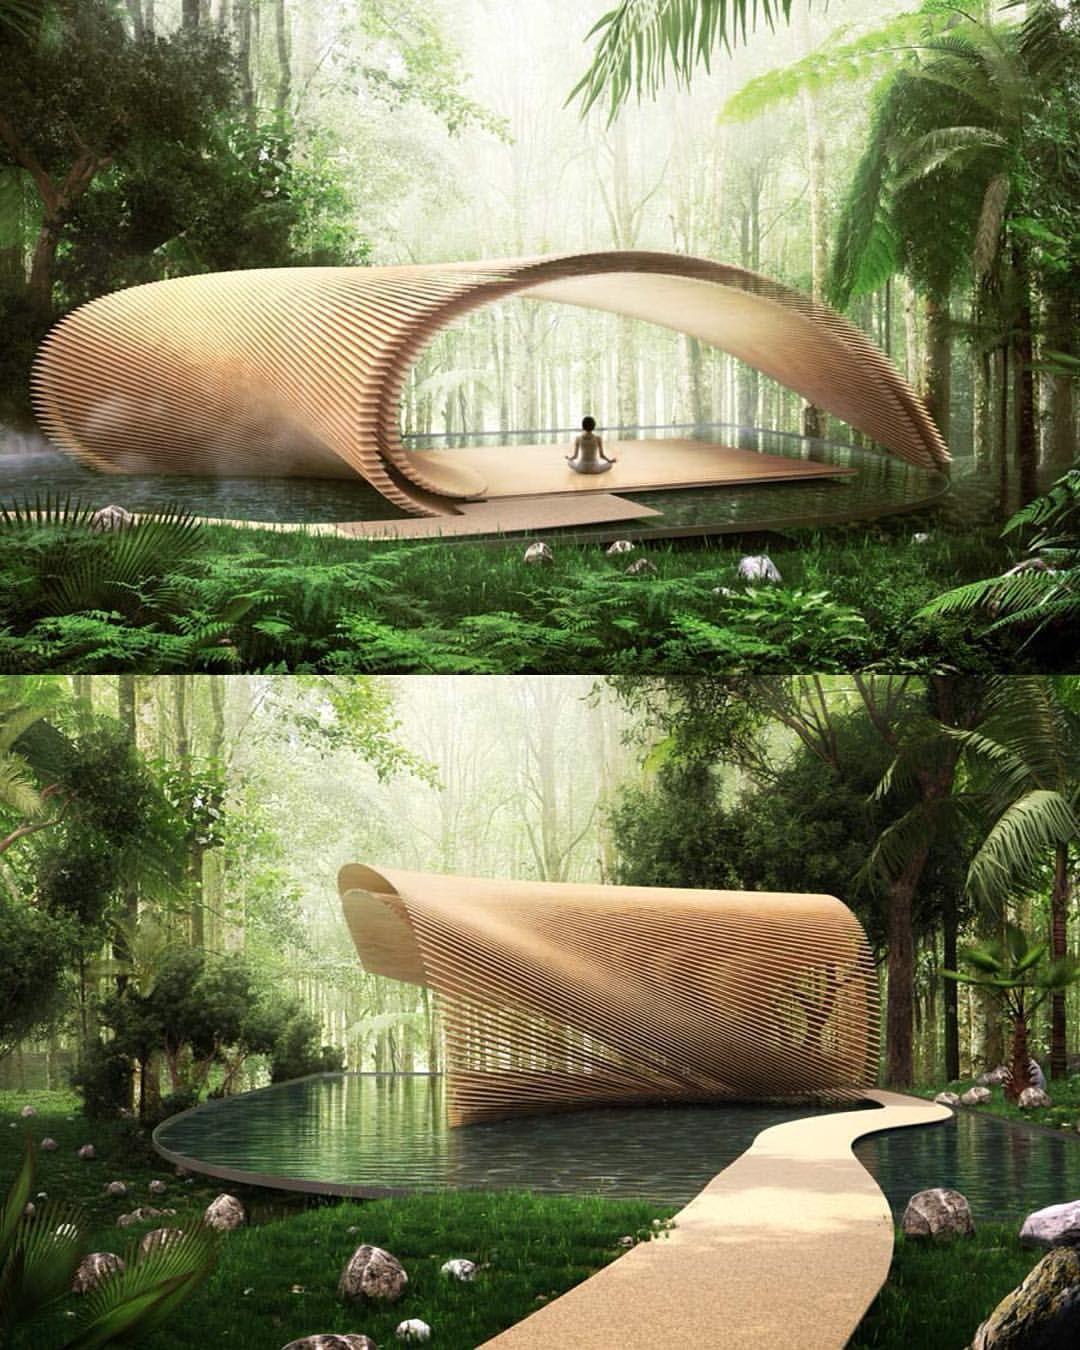 "Architecture & Design on Instagram: ""Tsubomi Villas by Kengo Kuma and Associates. (2018) 😍💚 📍#Bali #Indonesia #architectanddesign"""